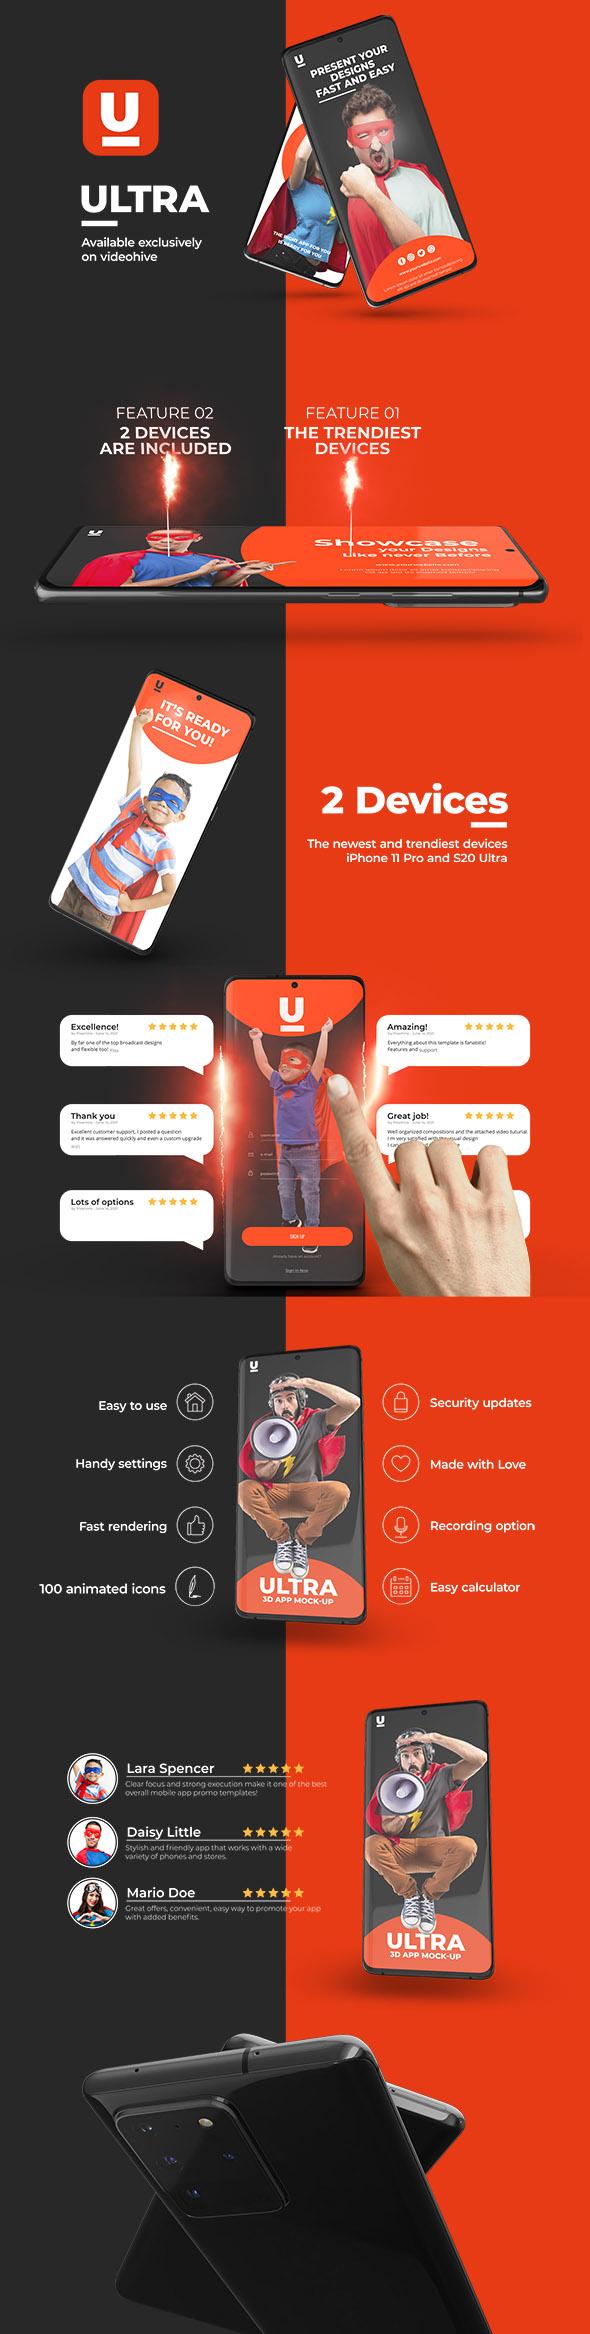 Ultra App Promo - 5